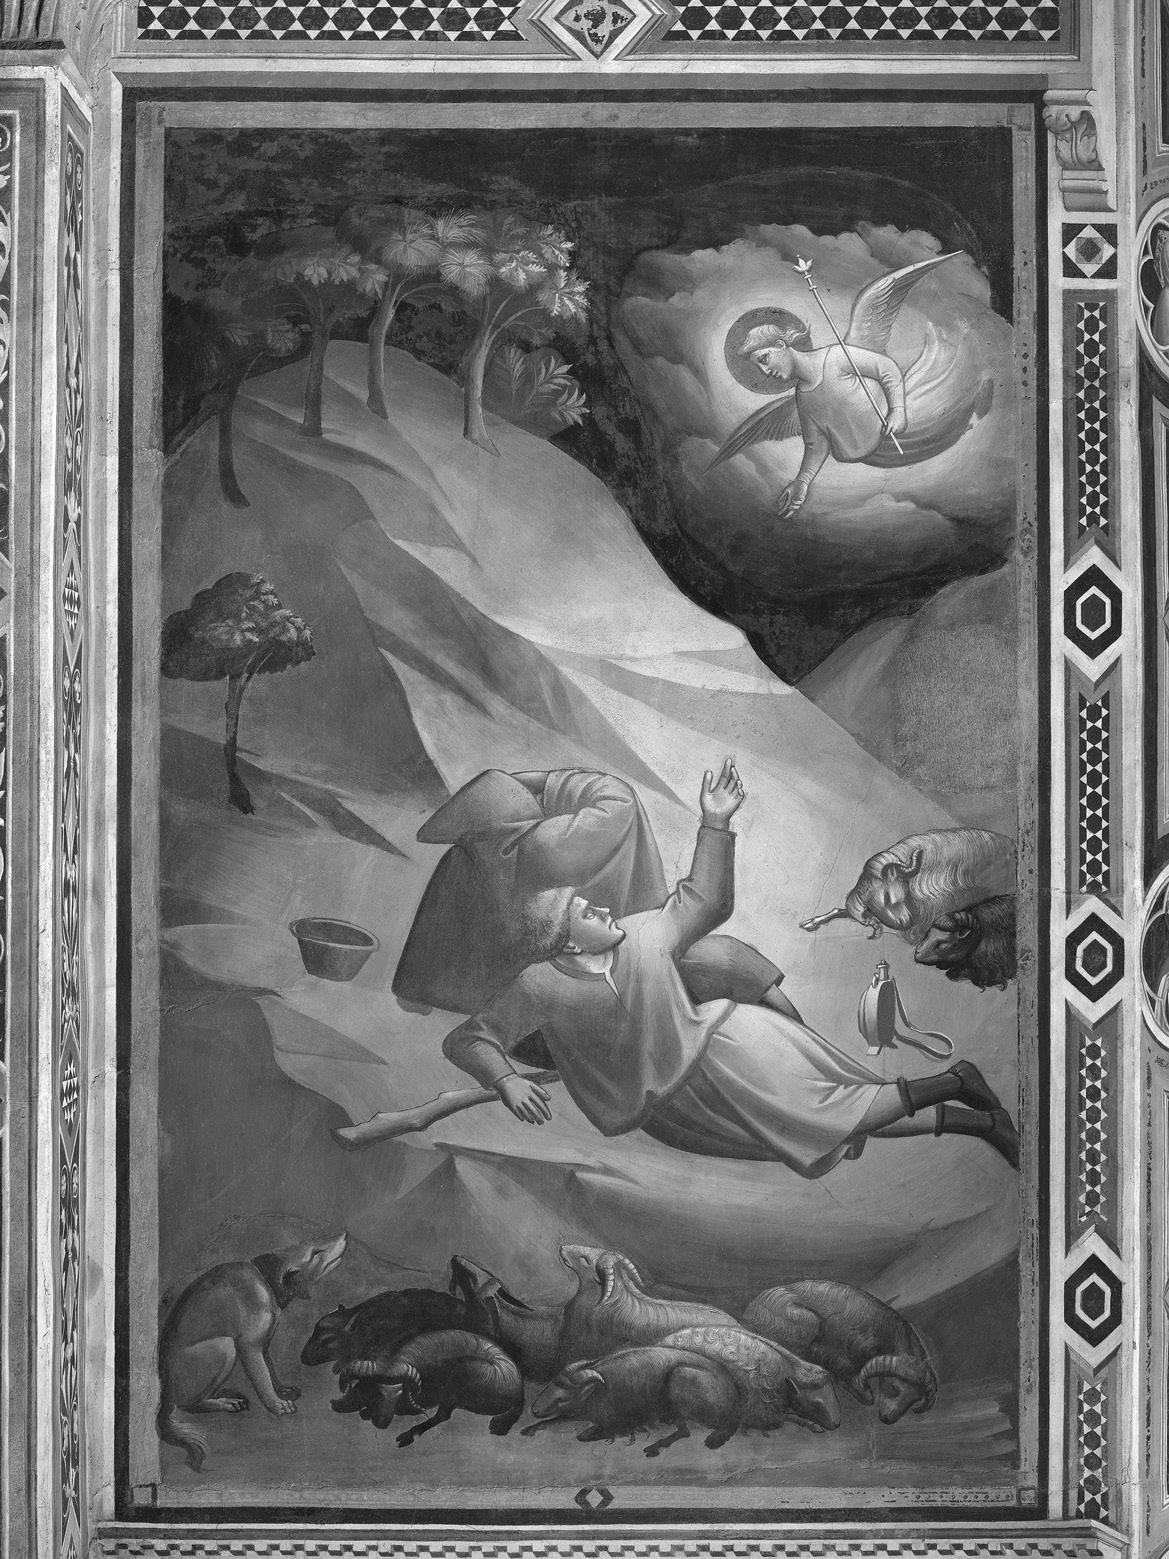 Colori In Luce Correggio notte/night (chapter 5) - vasari's words